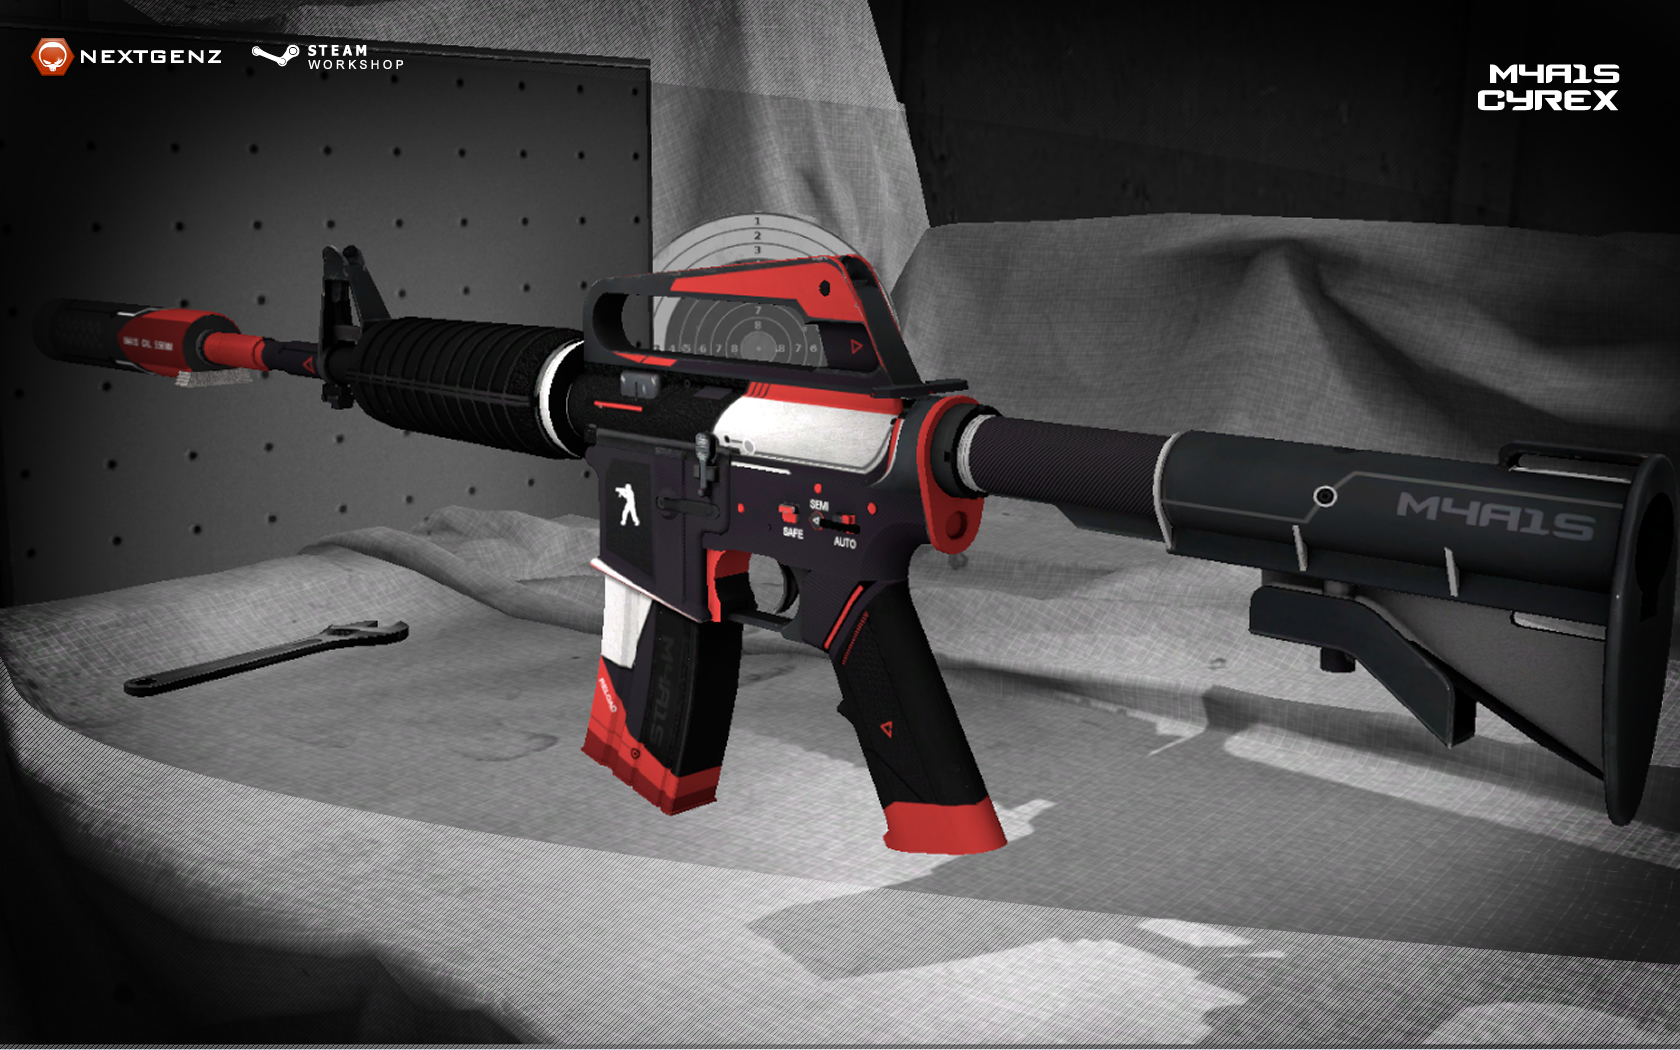 Steam Workshop M4a1s Cyrex